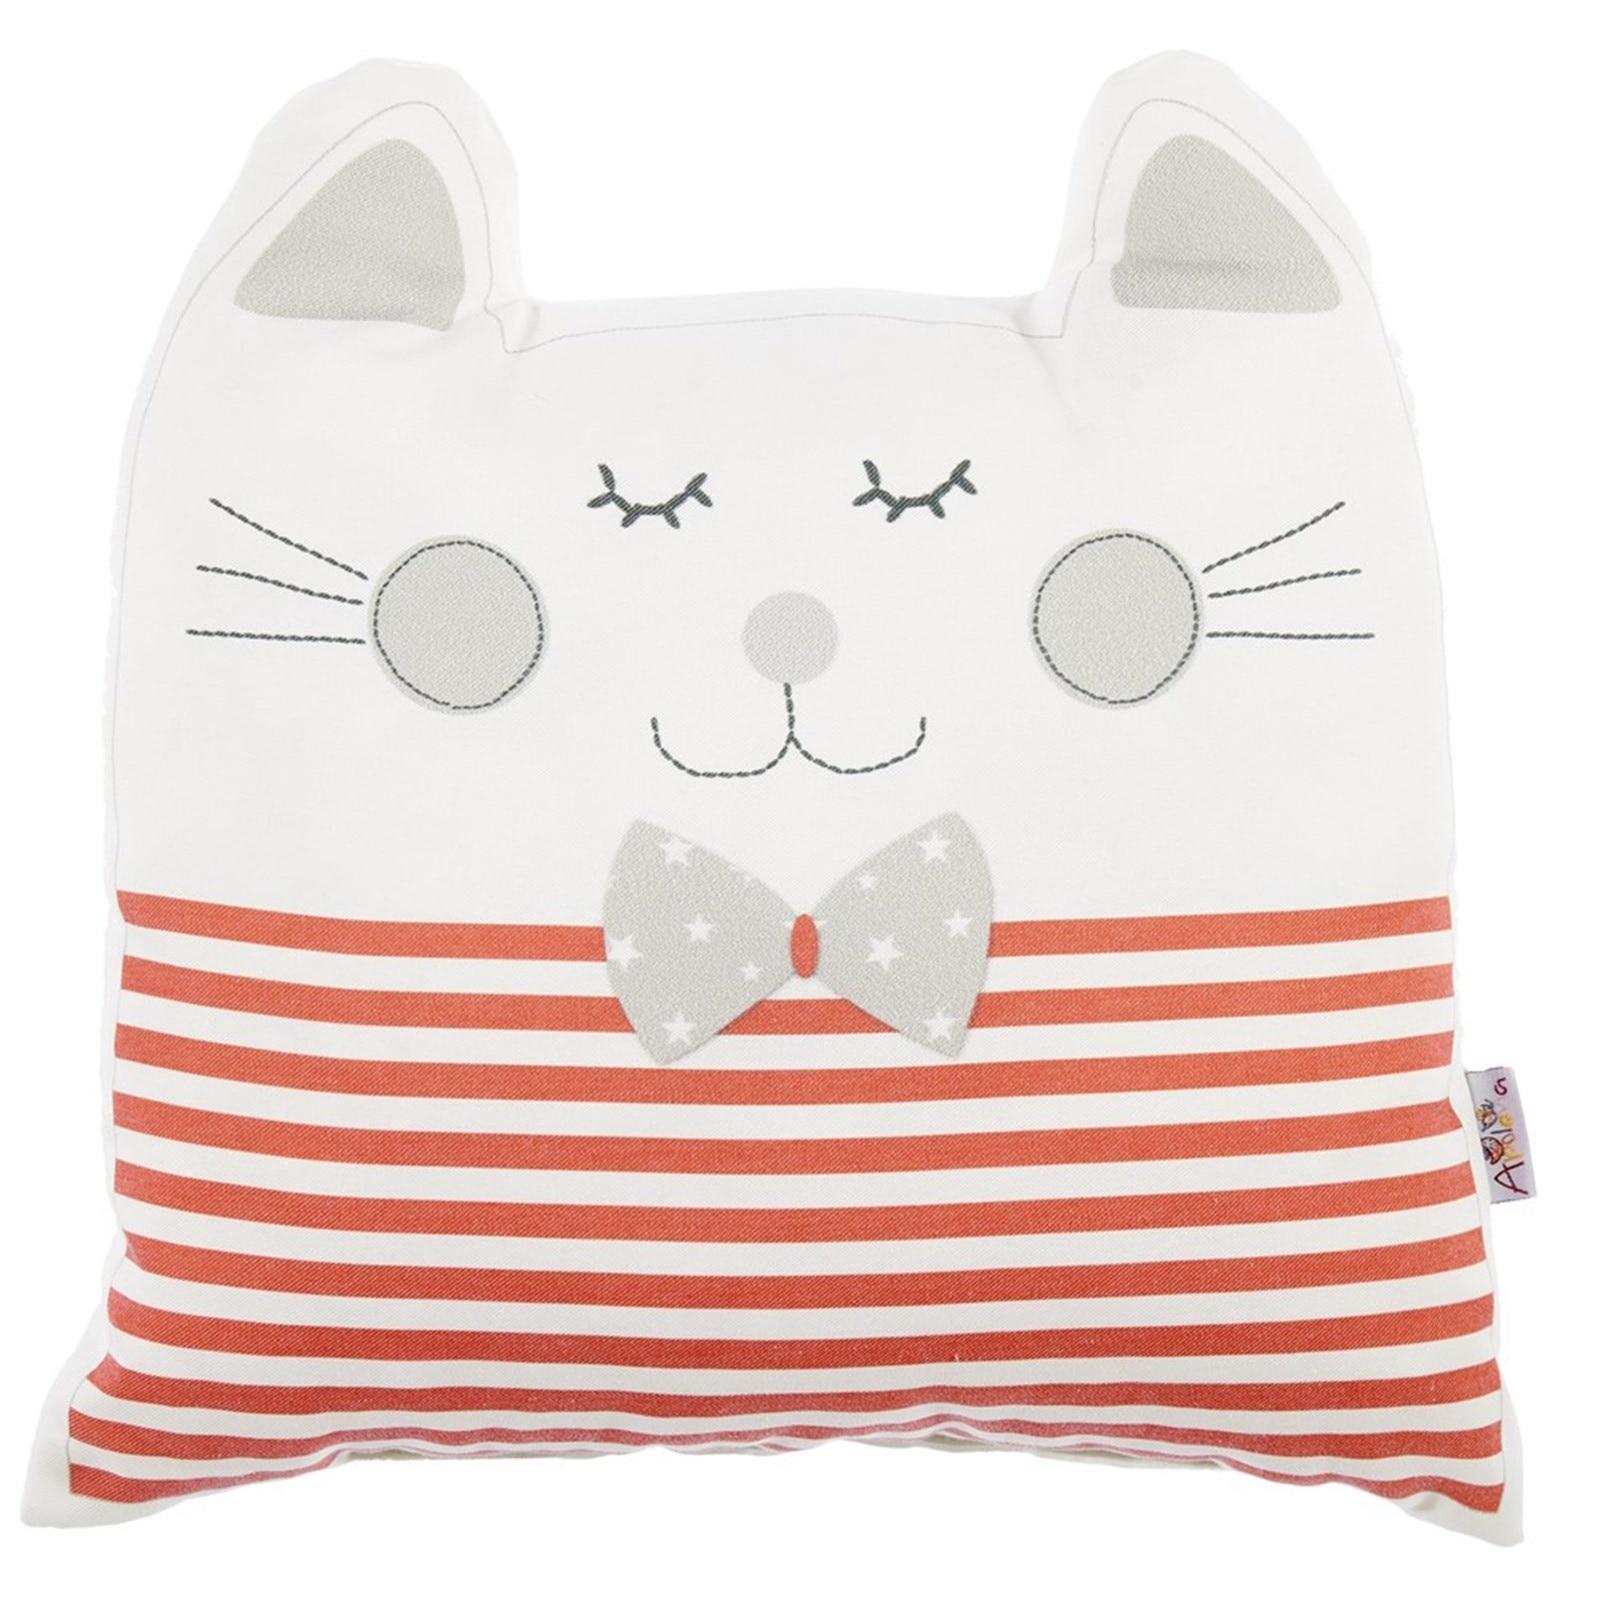 Ebebek Apolena Baby Toy Pillow